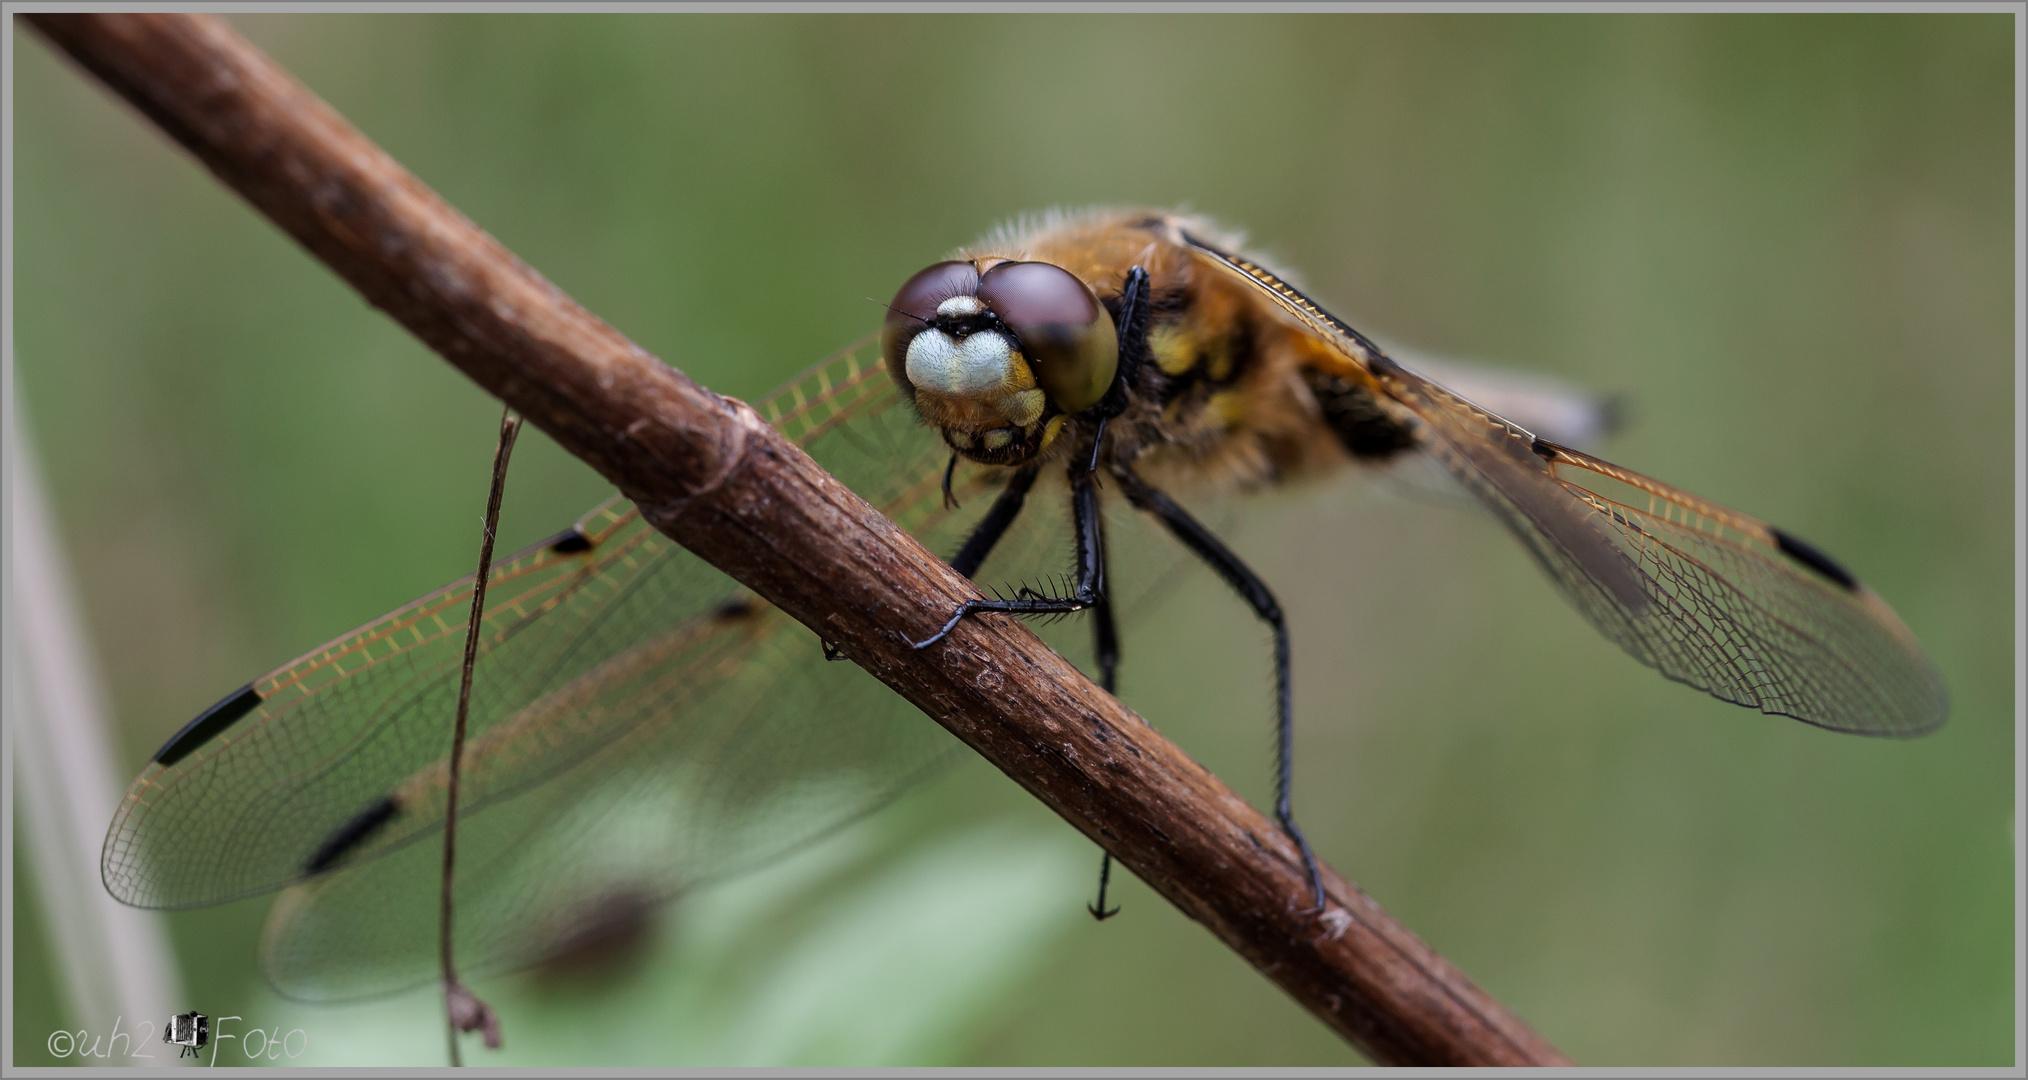 Landung einer Libelle